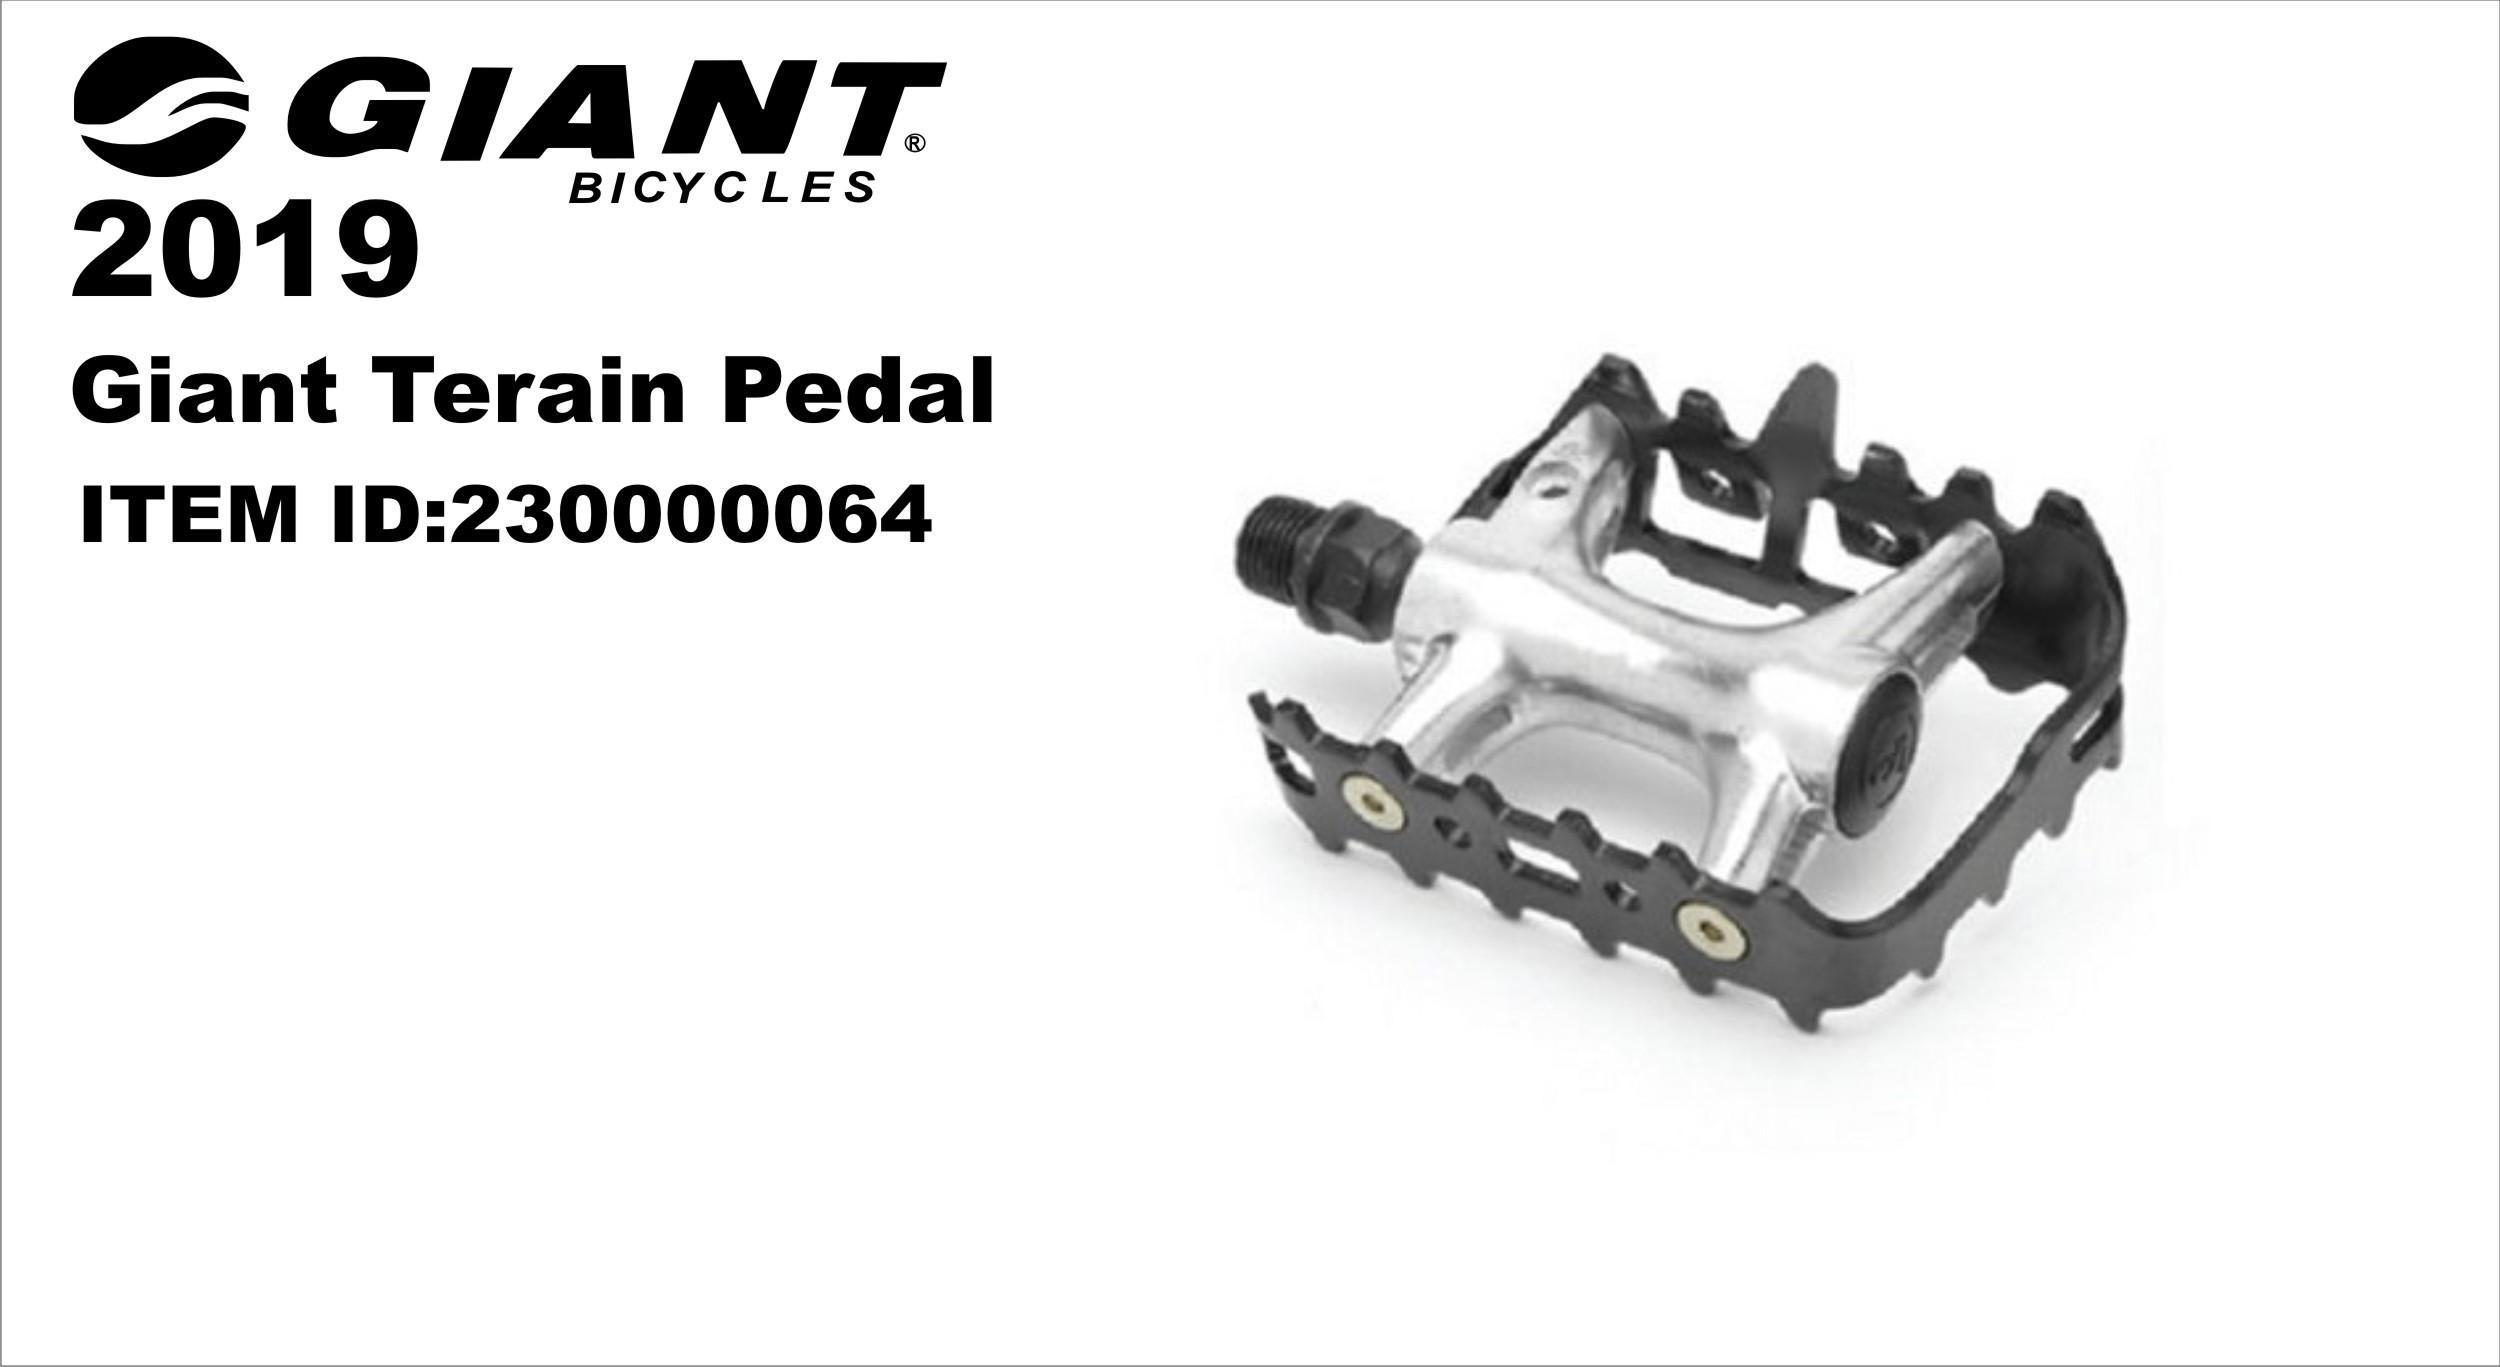 Giant Terrain Pedals - 230000064